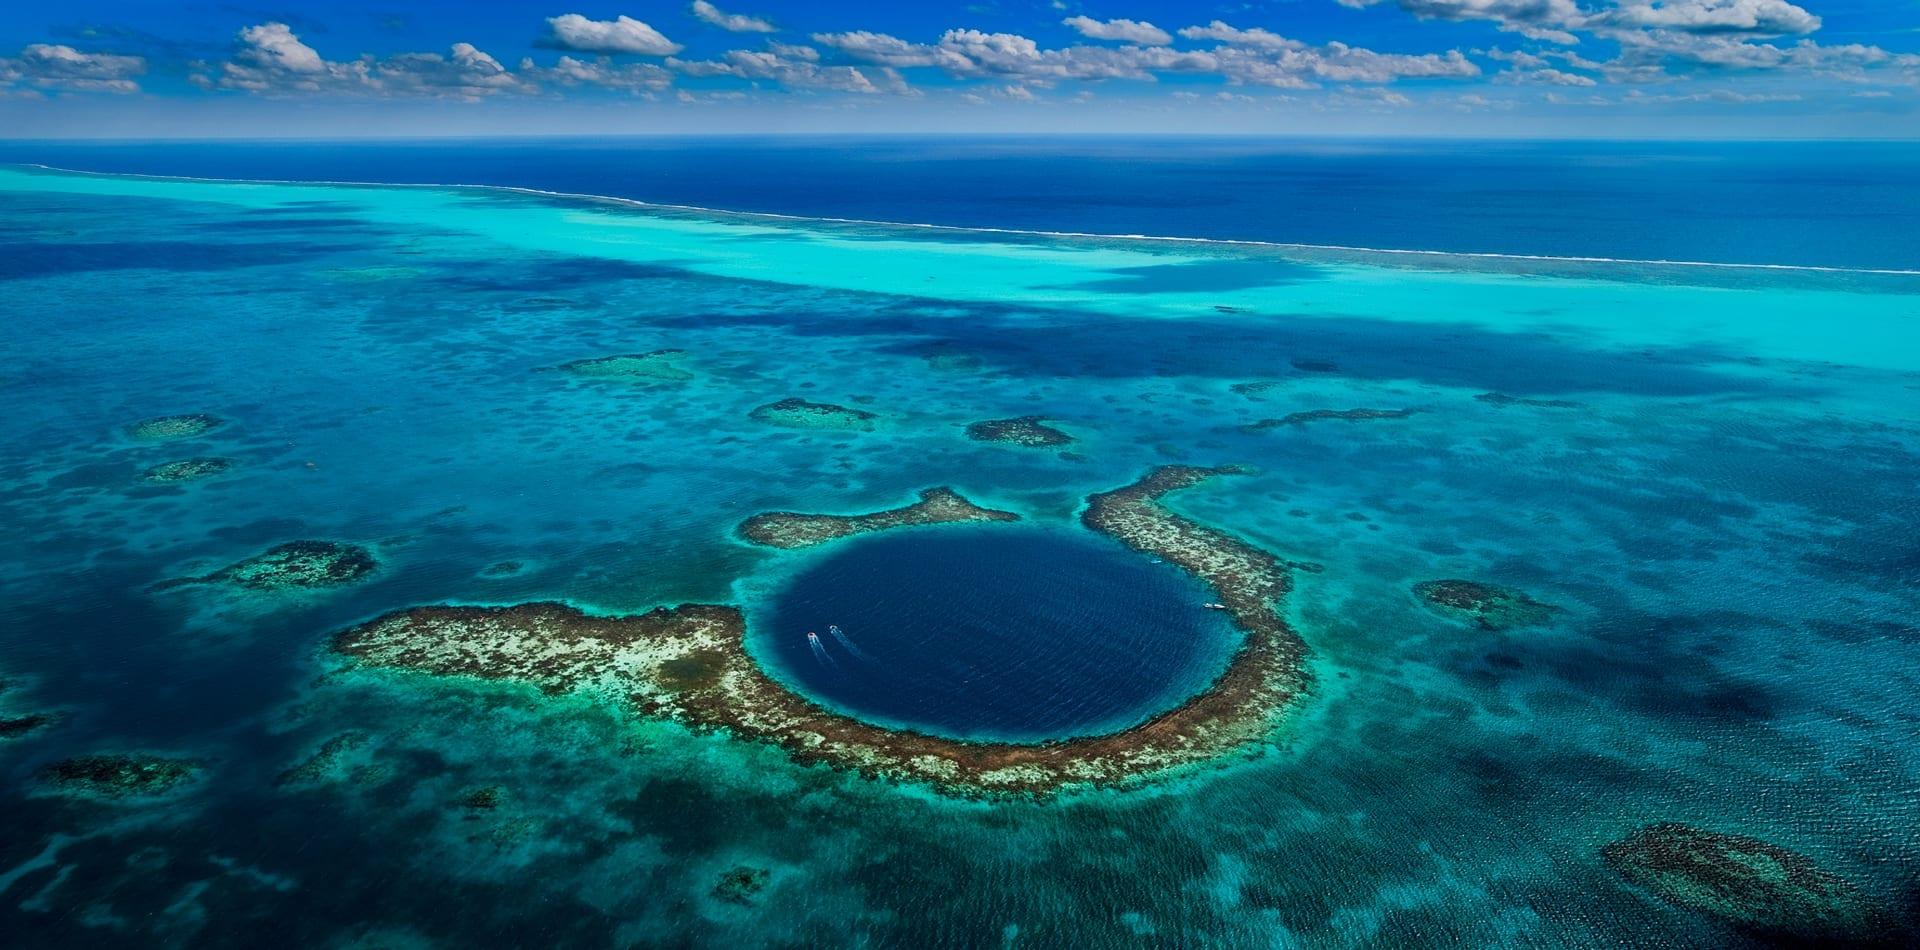 belize blue hole aerial view